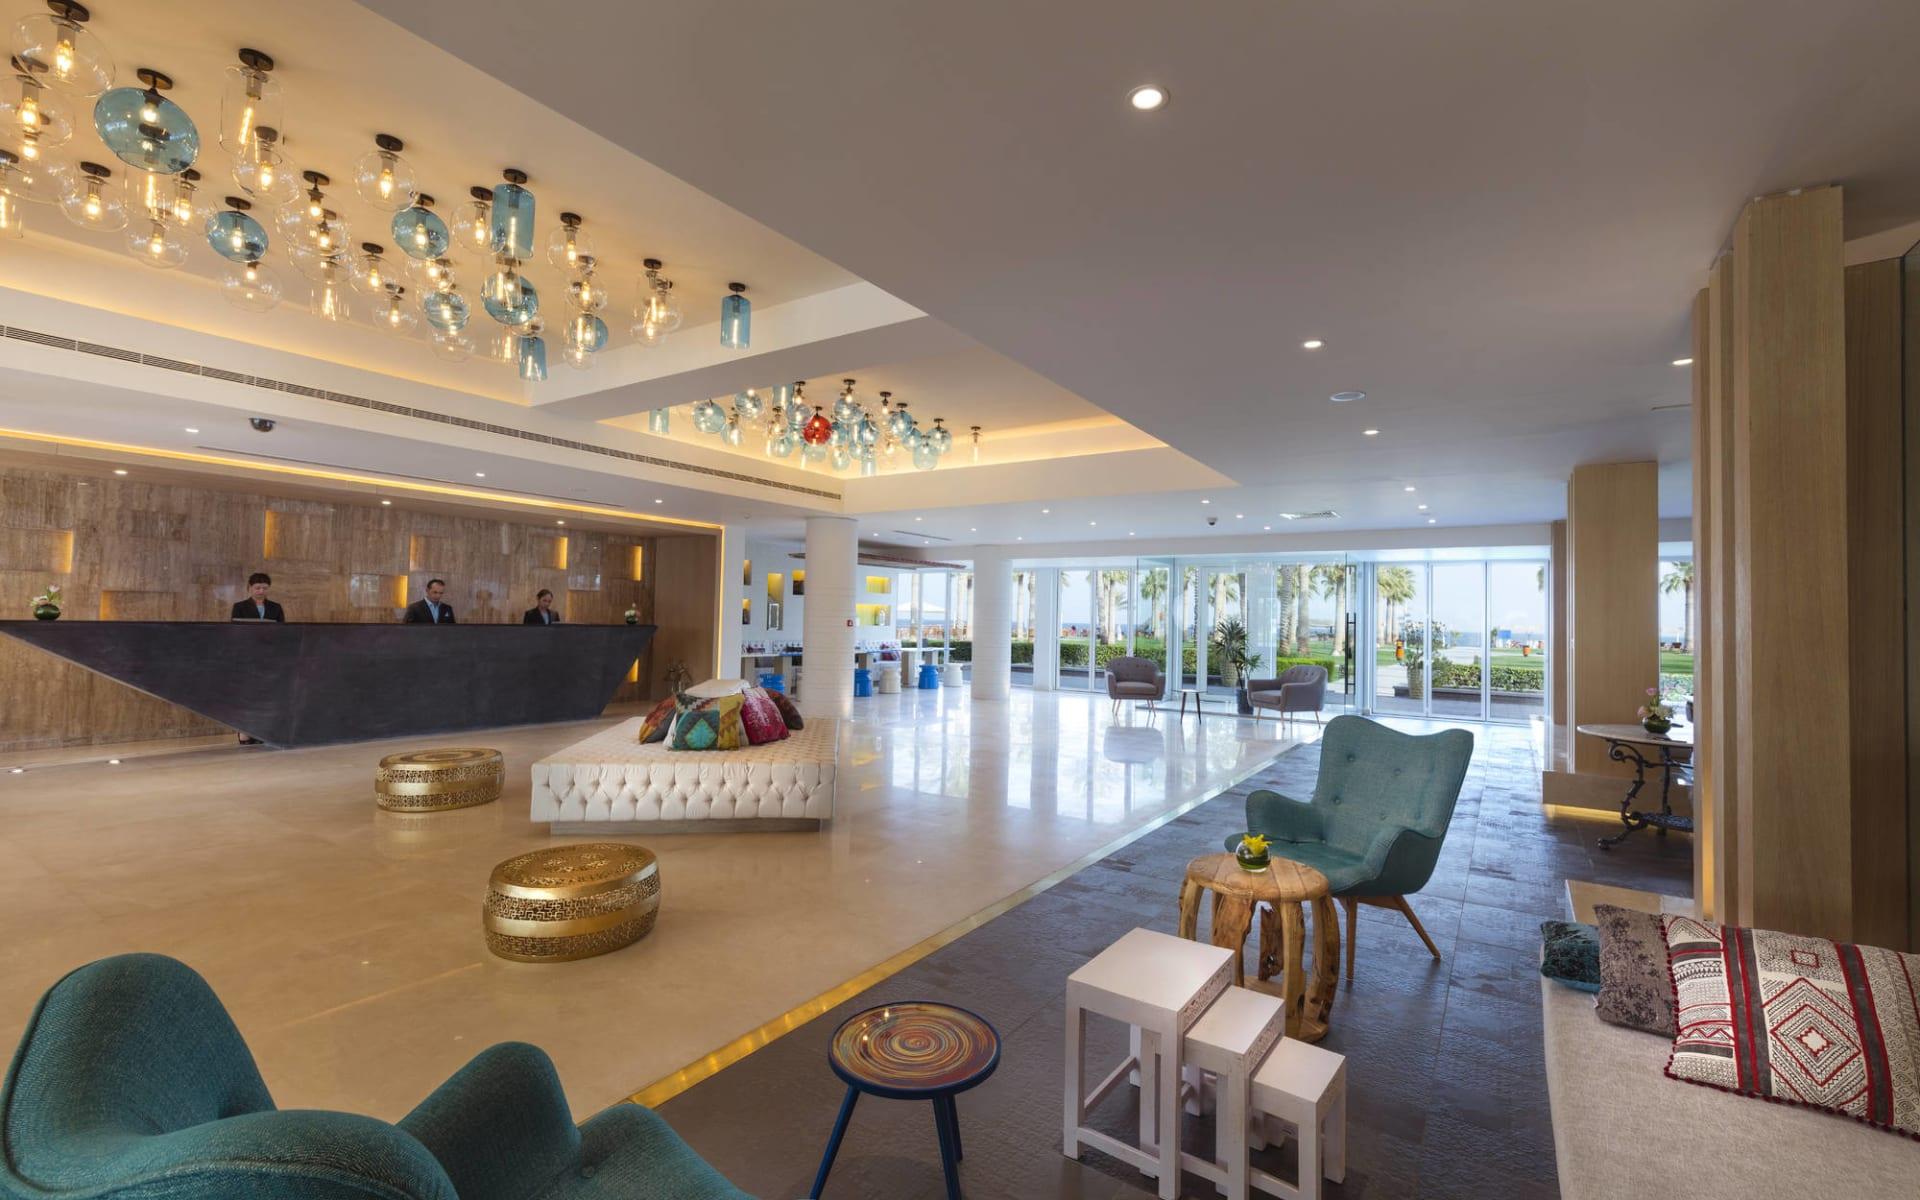 Sealine Beach A Murwab Resort in Doha:  Lobby